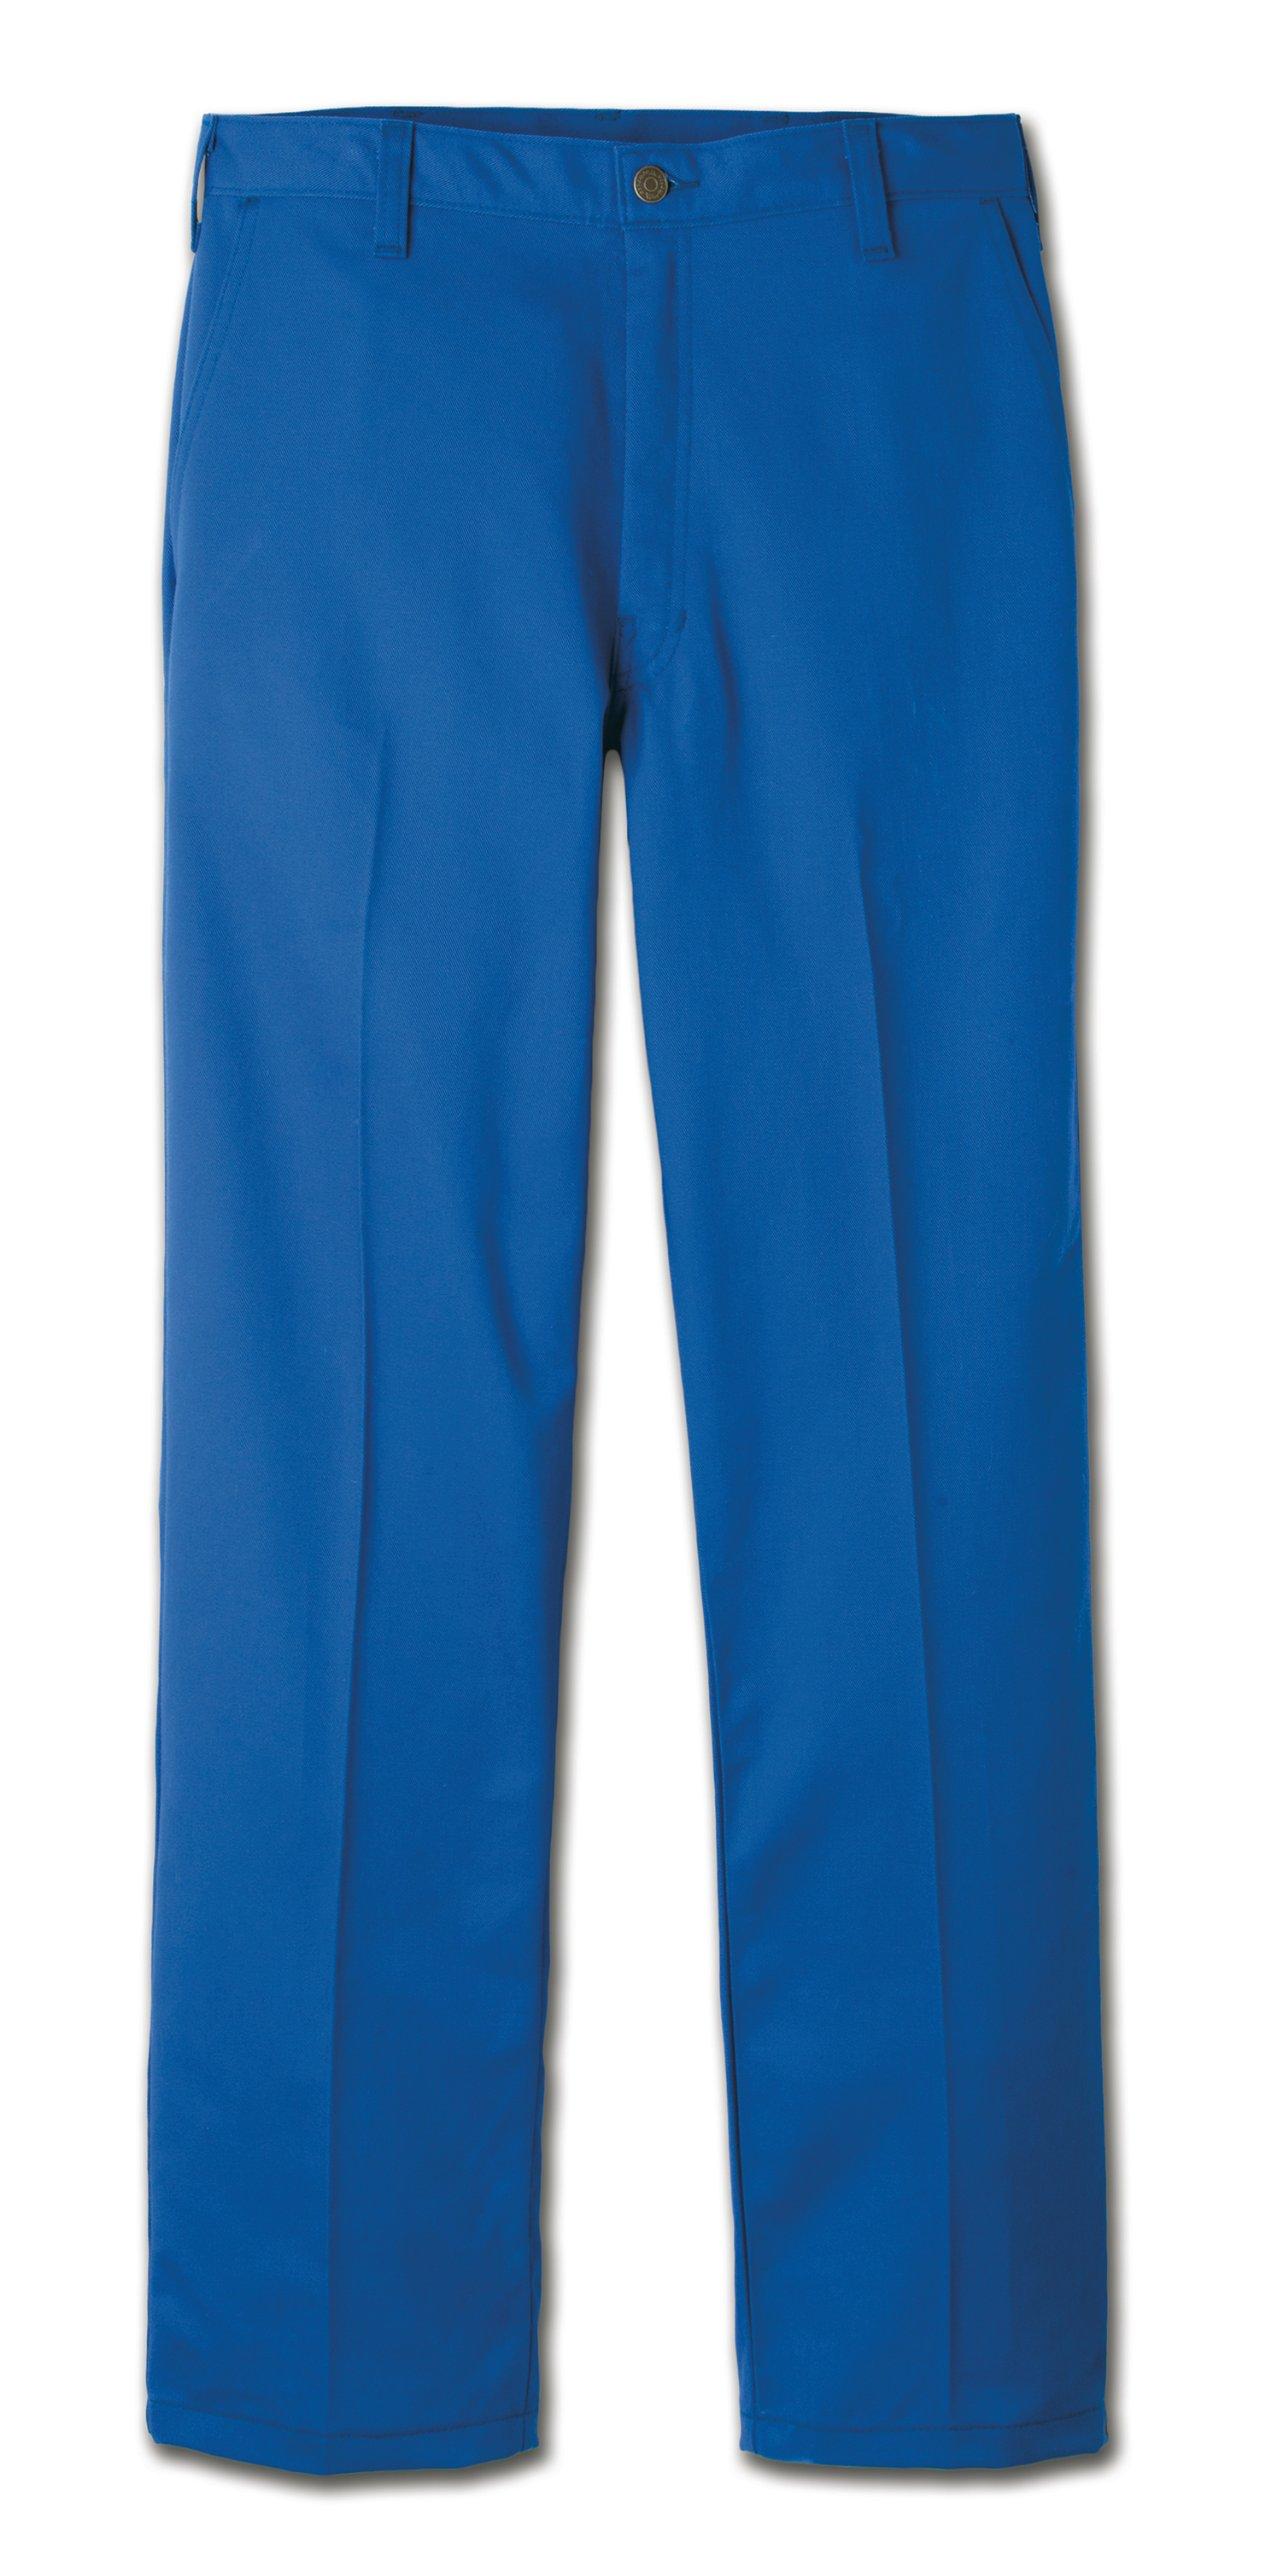 Workrite 431UT95RB40-30 Flame Resistant 9.5 oz UltraSoft Work Pant, 40 Waist Size, 30 Inseam, Royal Blue